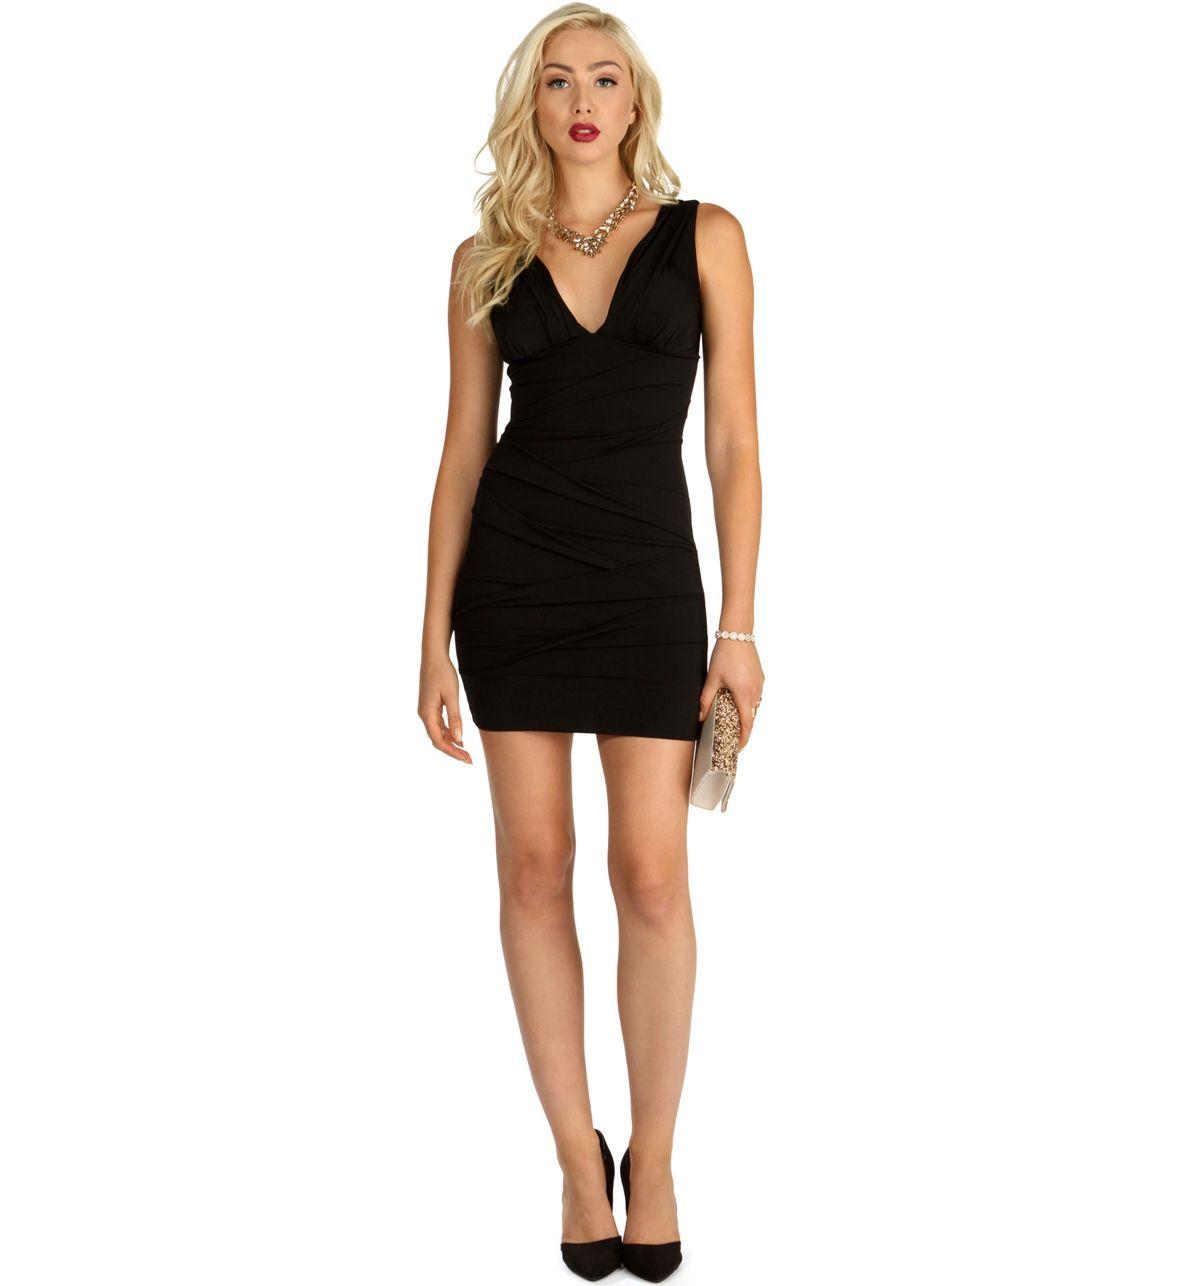 Black dresses for wedding  Black V Neck Bandage Dress  Weddings to come   Pinterest  Black